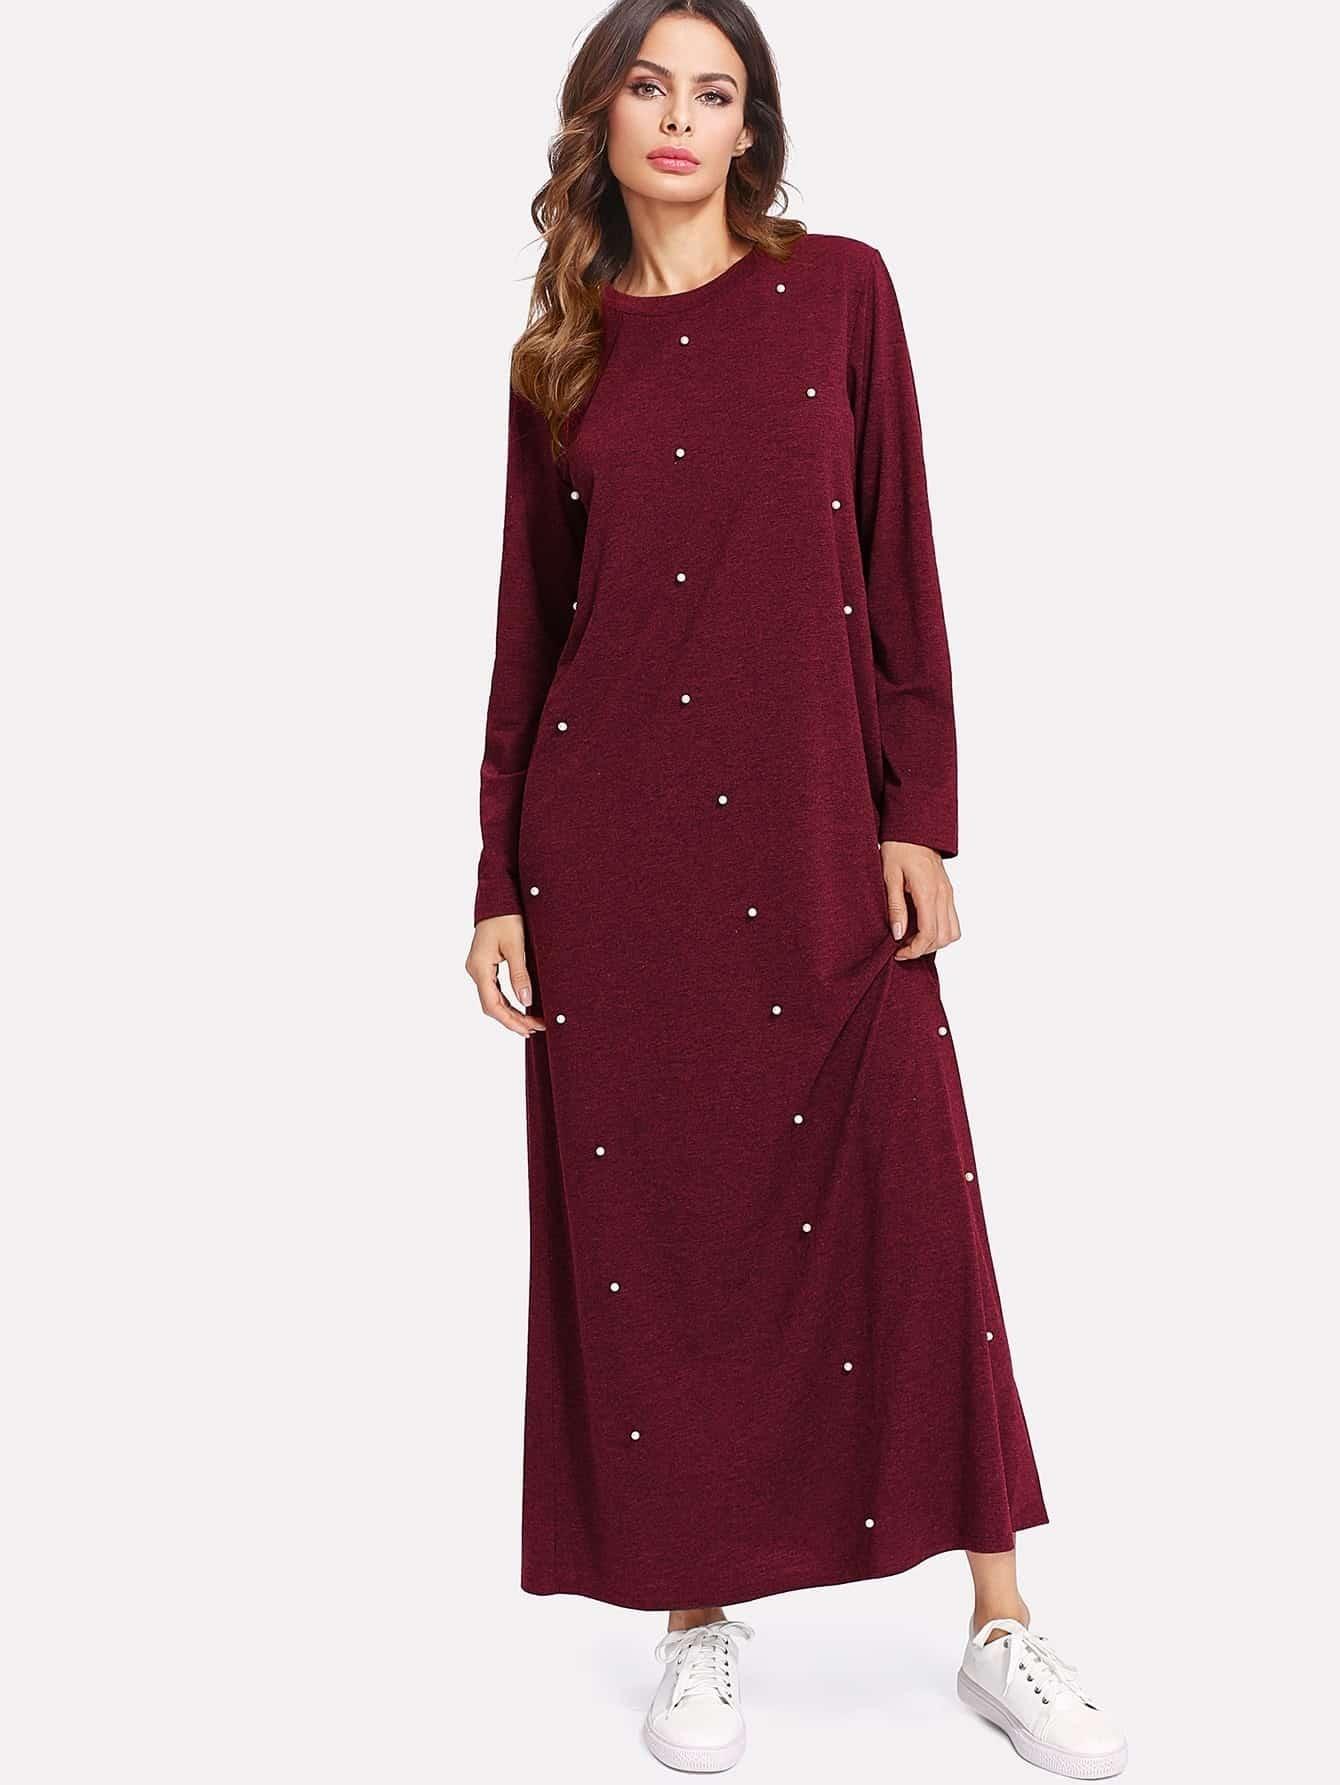 Pearl Beading Marled Knit Dress